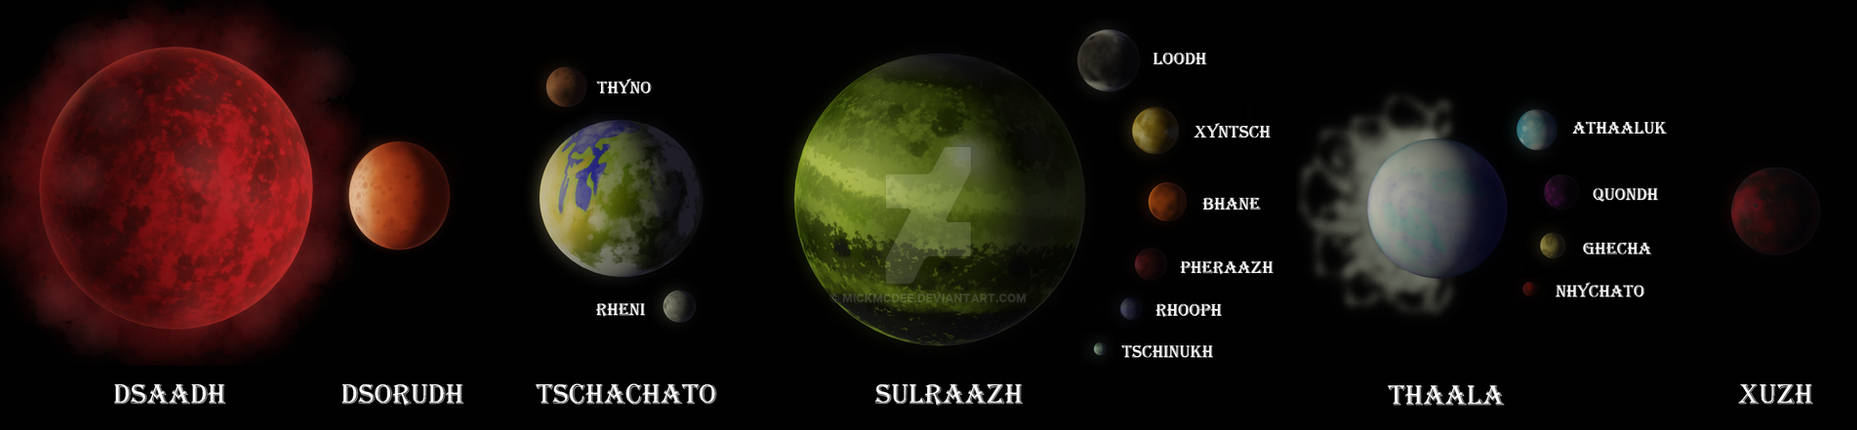 DSAADH Solar System (with MS Pain' 3D)